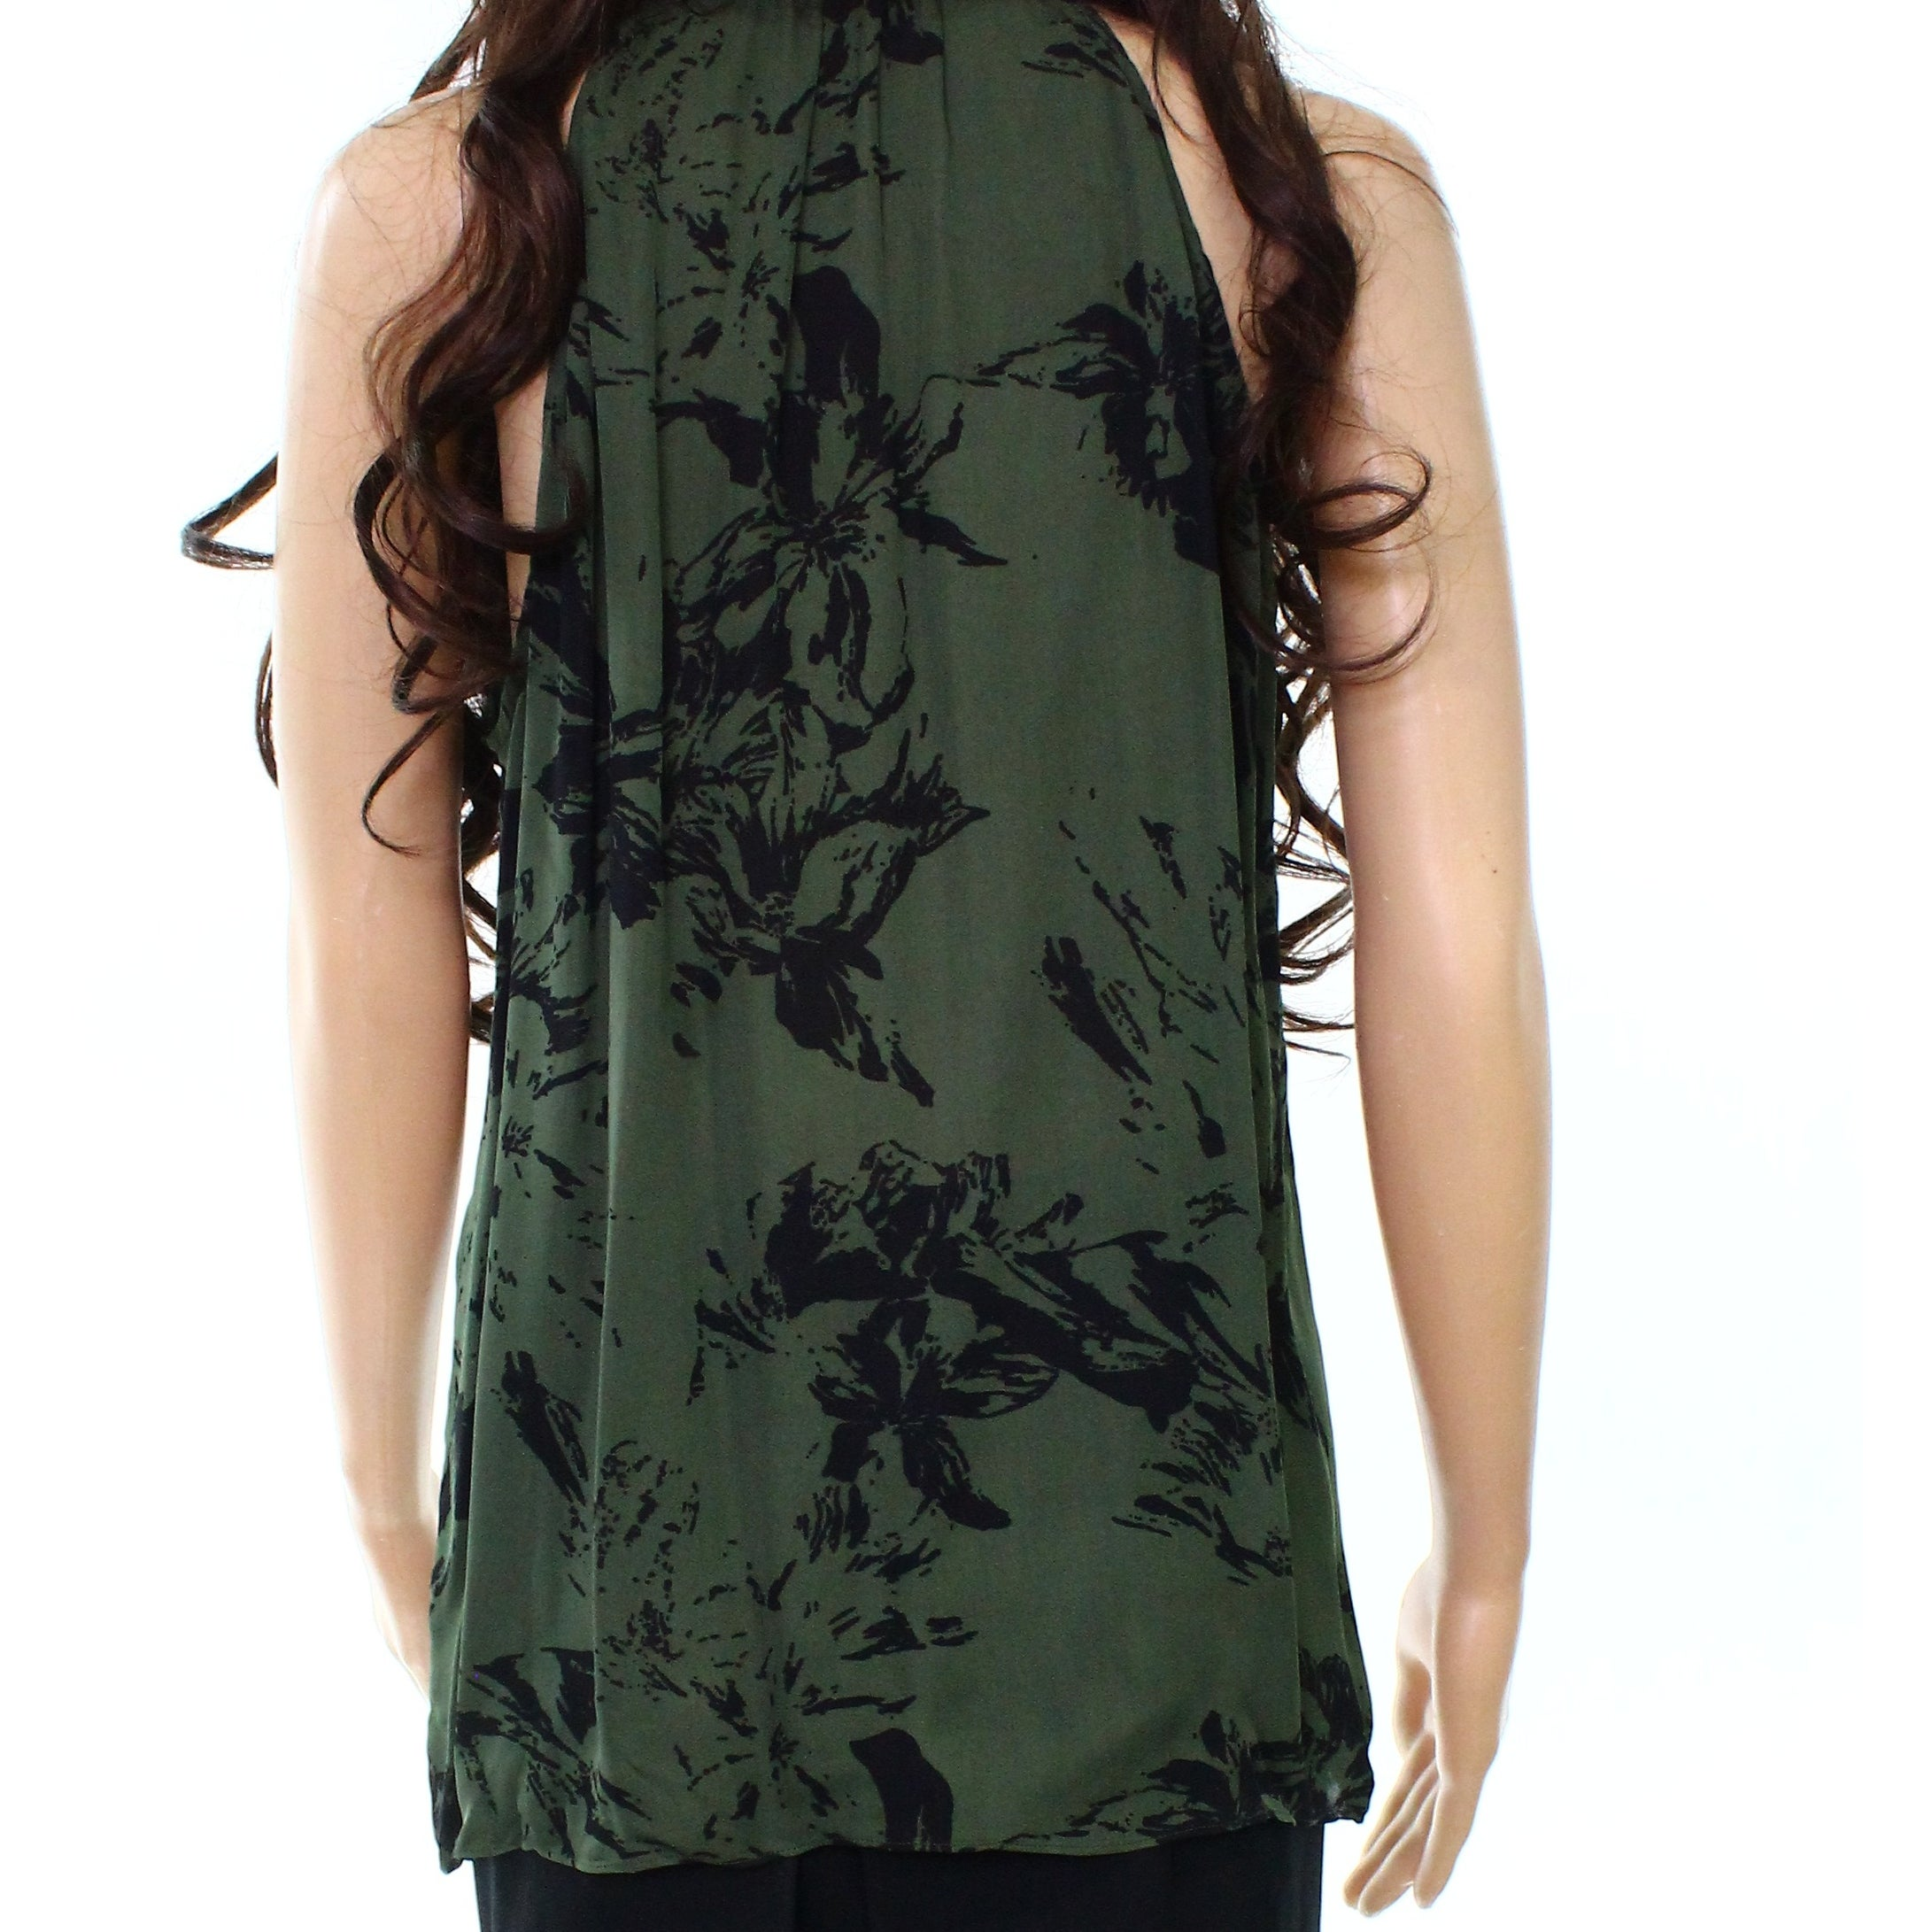 719deb3e31c Parker NEW Green Black Womens Medium M Abstract Print Silk Halter Top